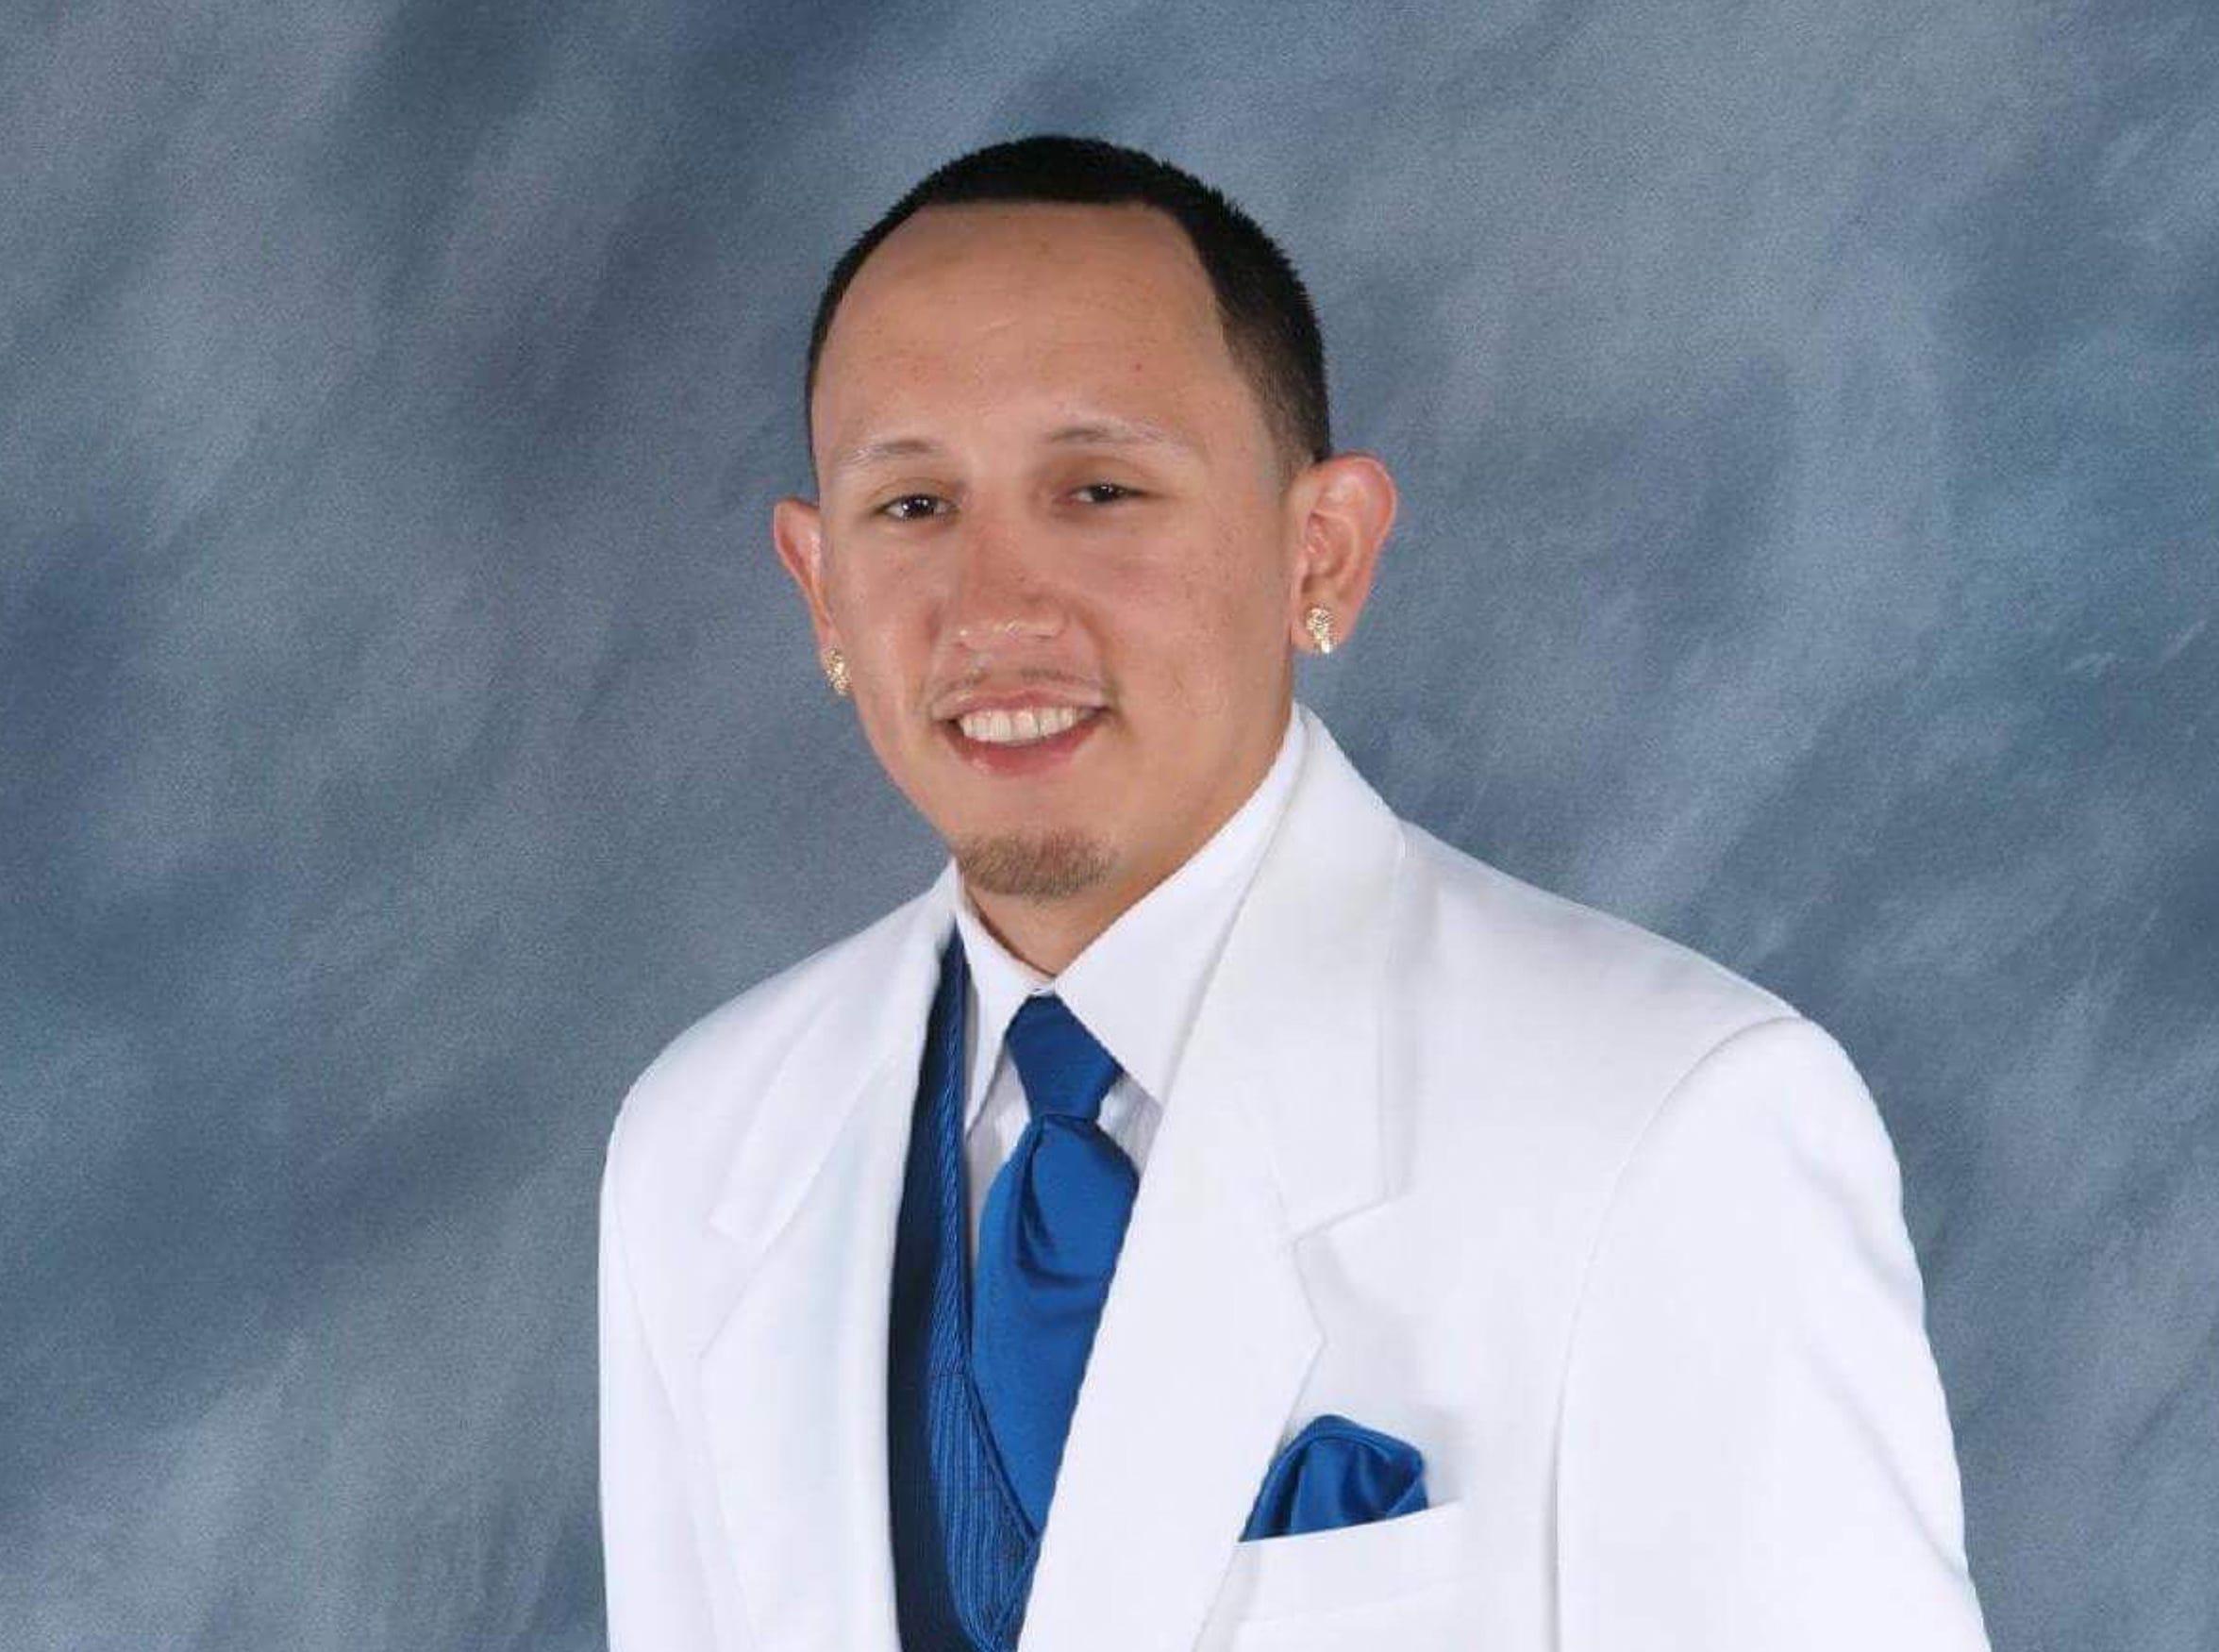 Eric Lee Tunchez